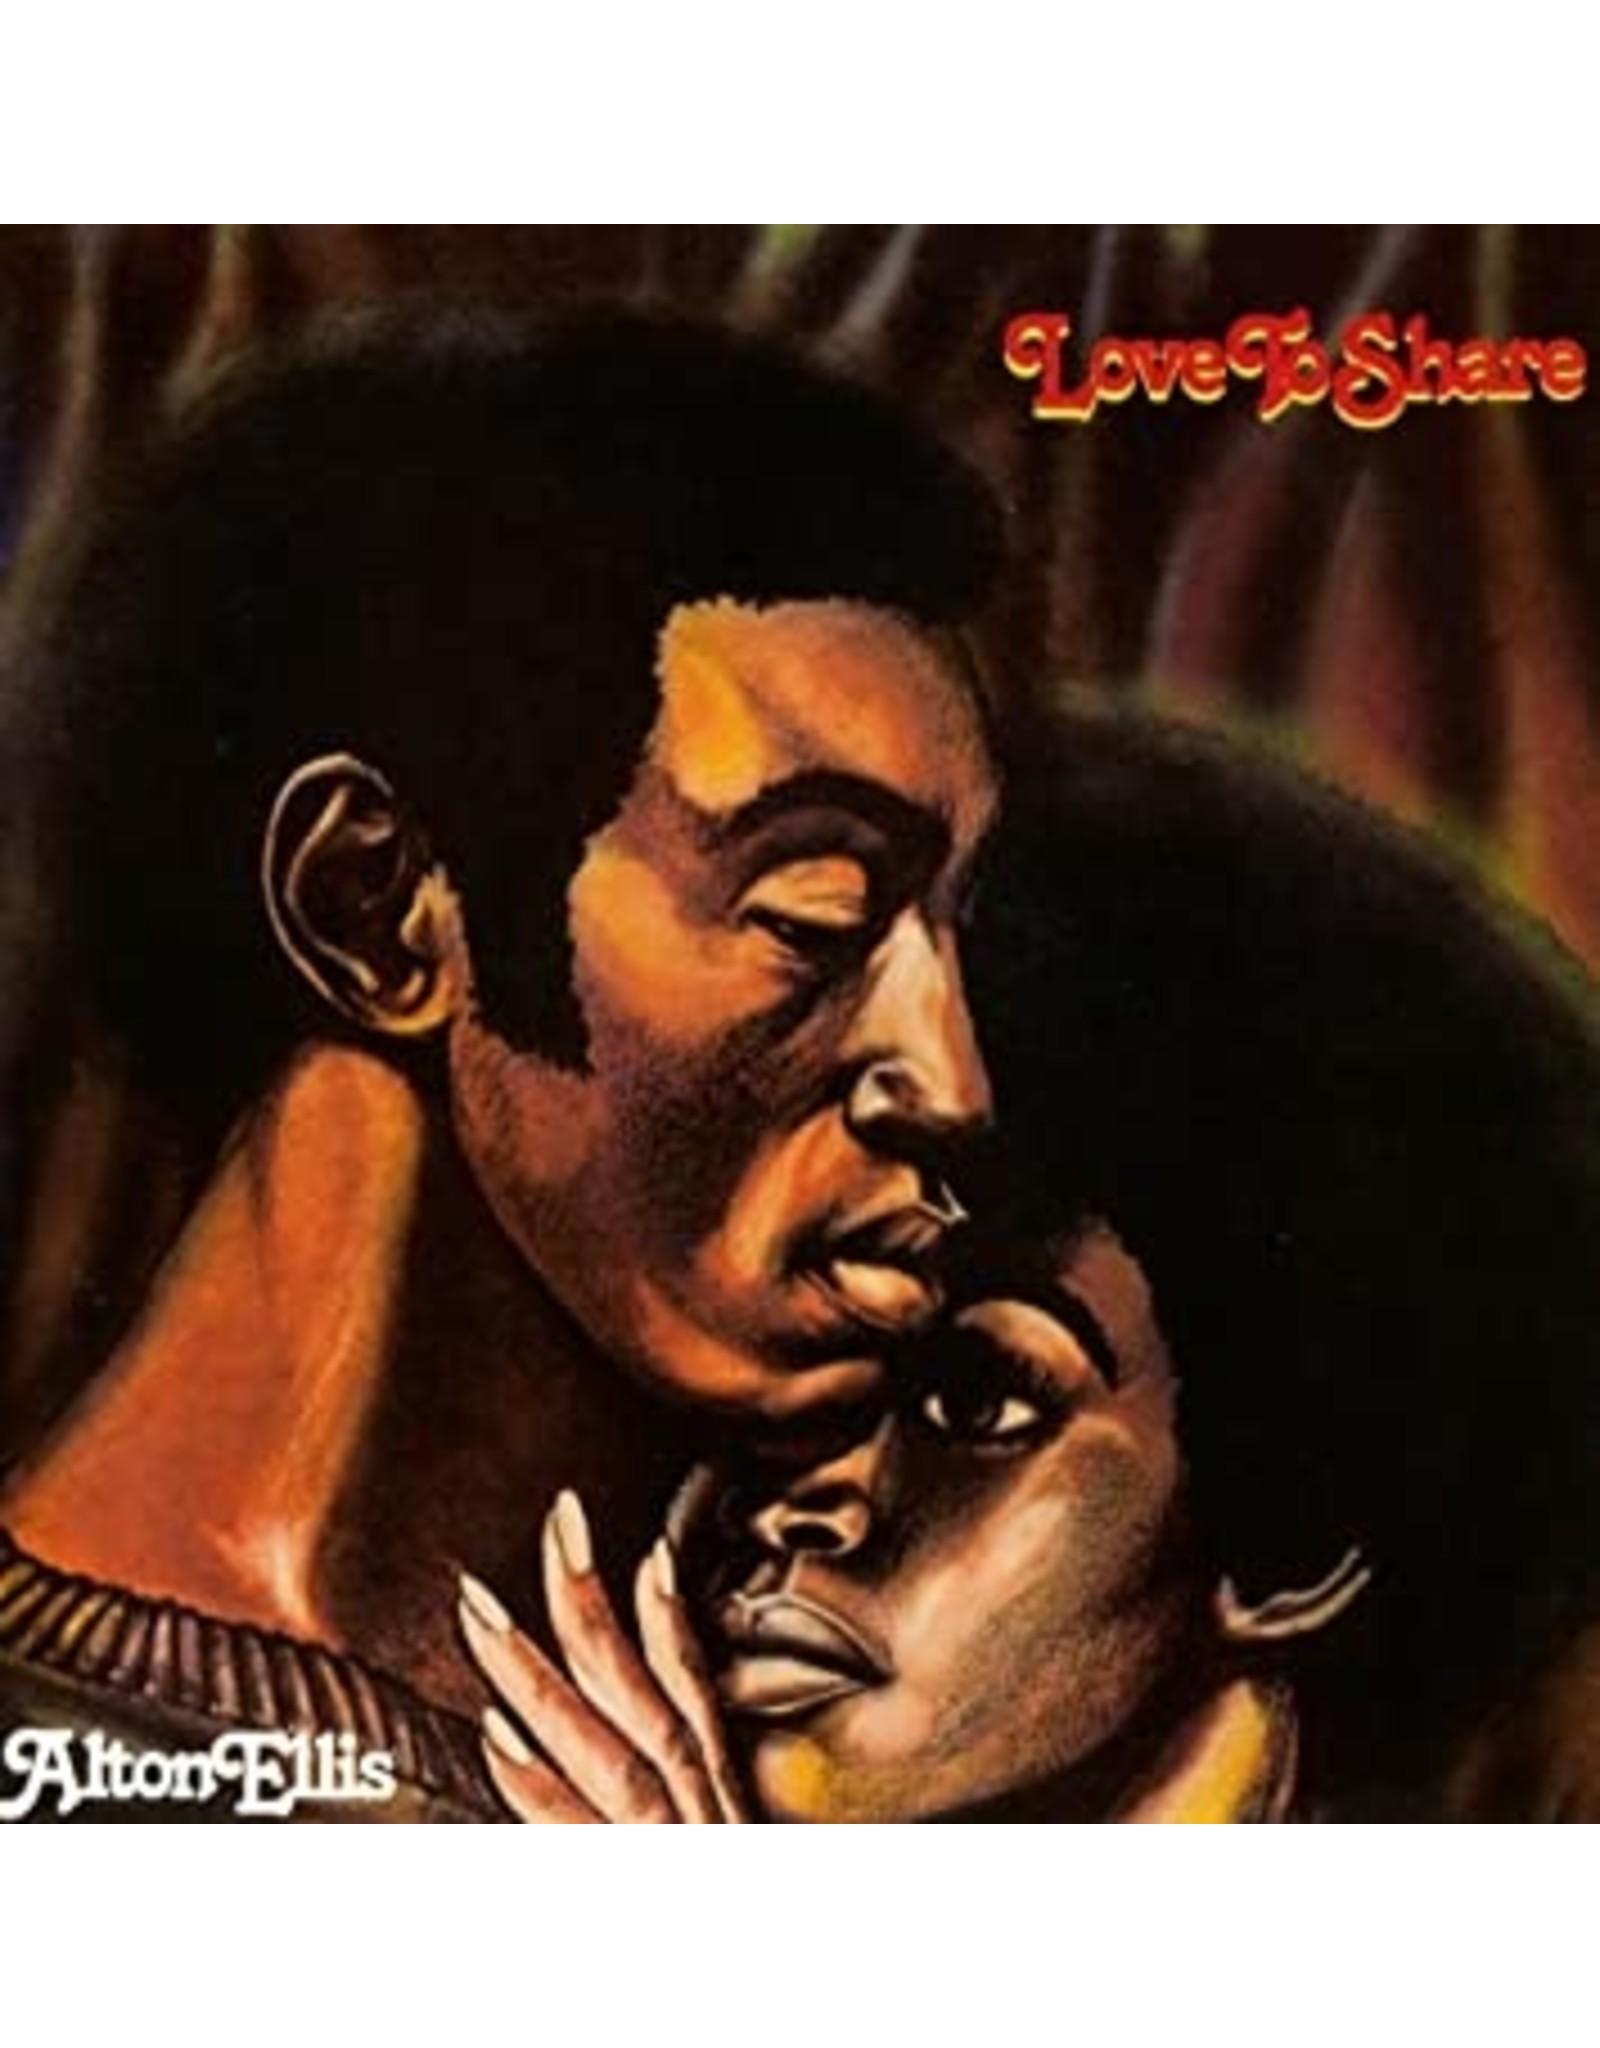 New Vinyl Alton Ellis - Love To Share LP